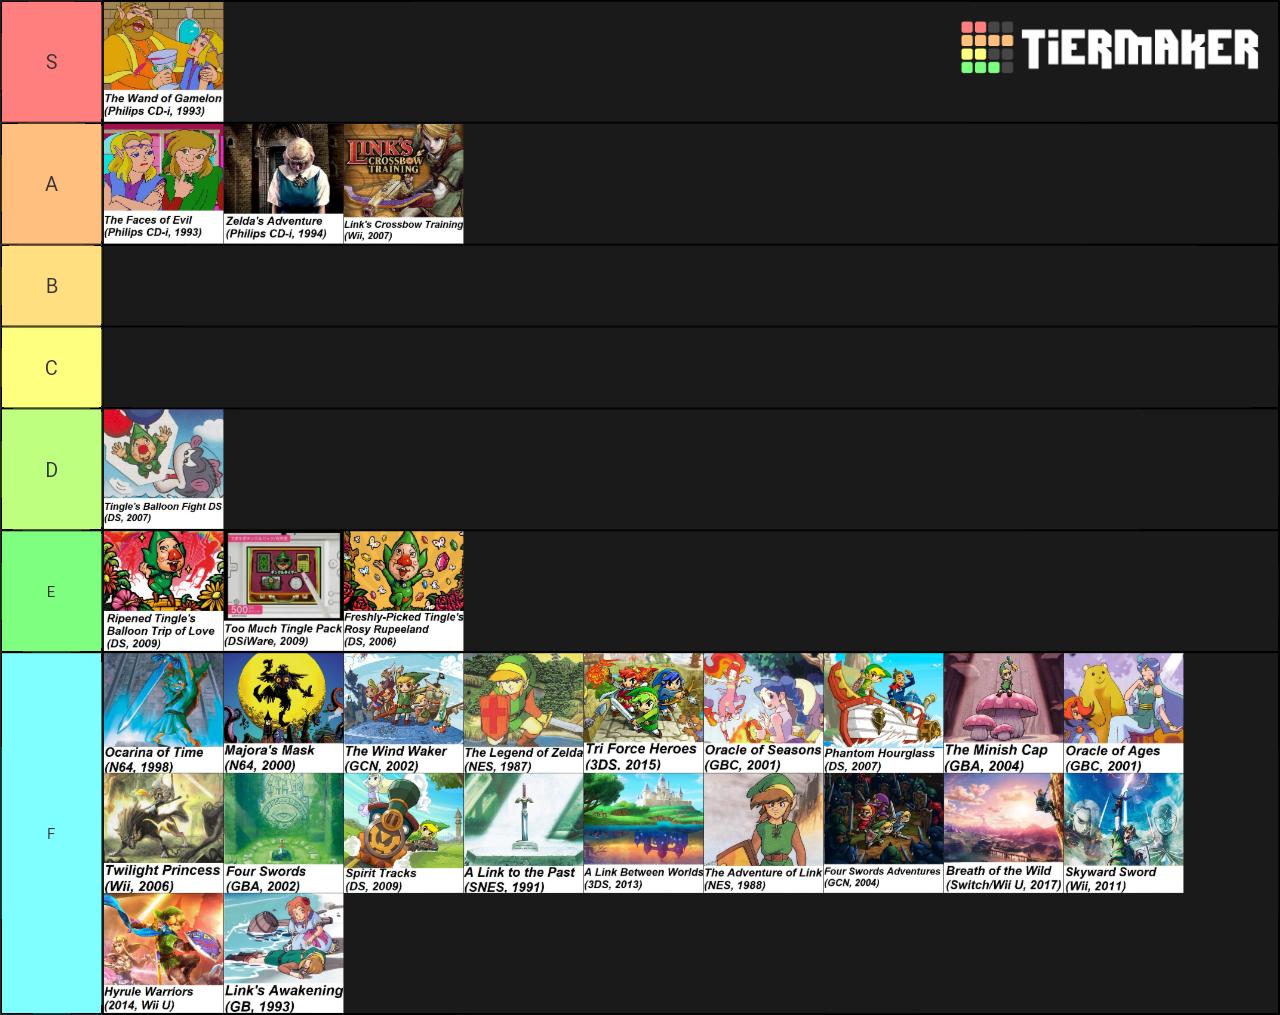 Definitive Zelda Tier List Definitive List Tier Zelda Check More At Https Www Fsy Ovh Zelda Definitive Zelda Tier List All